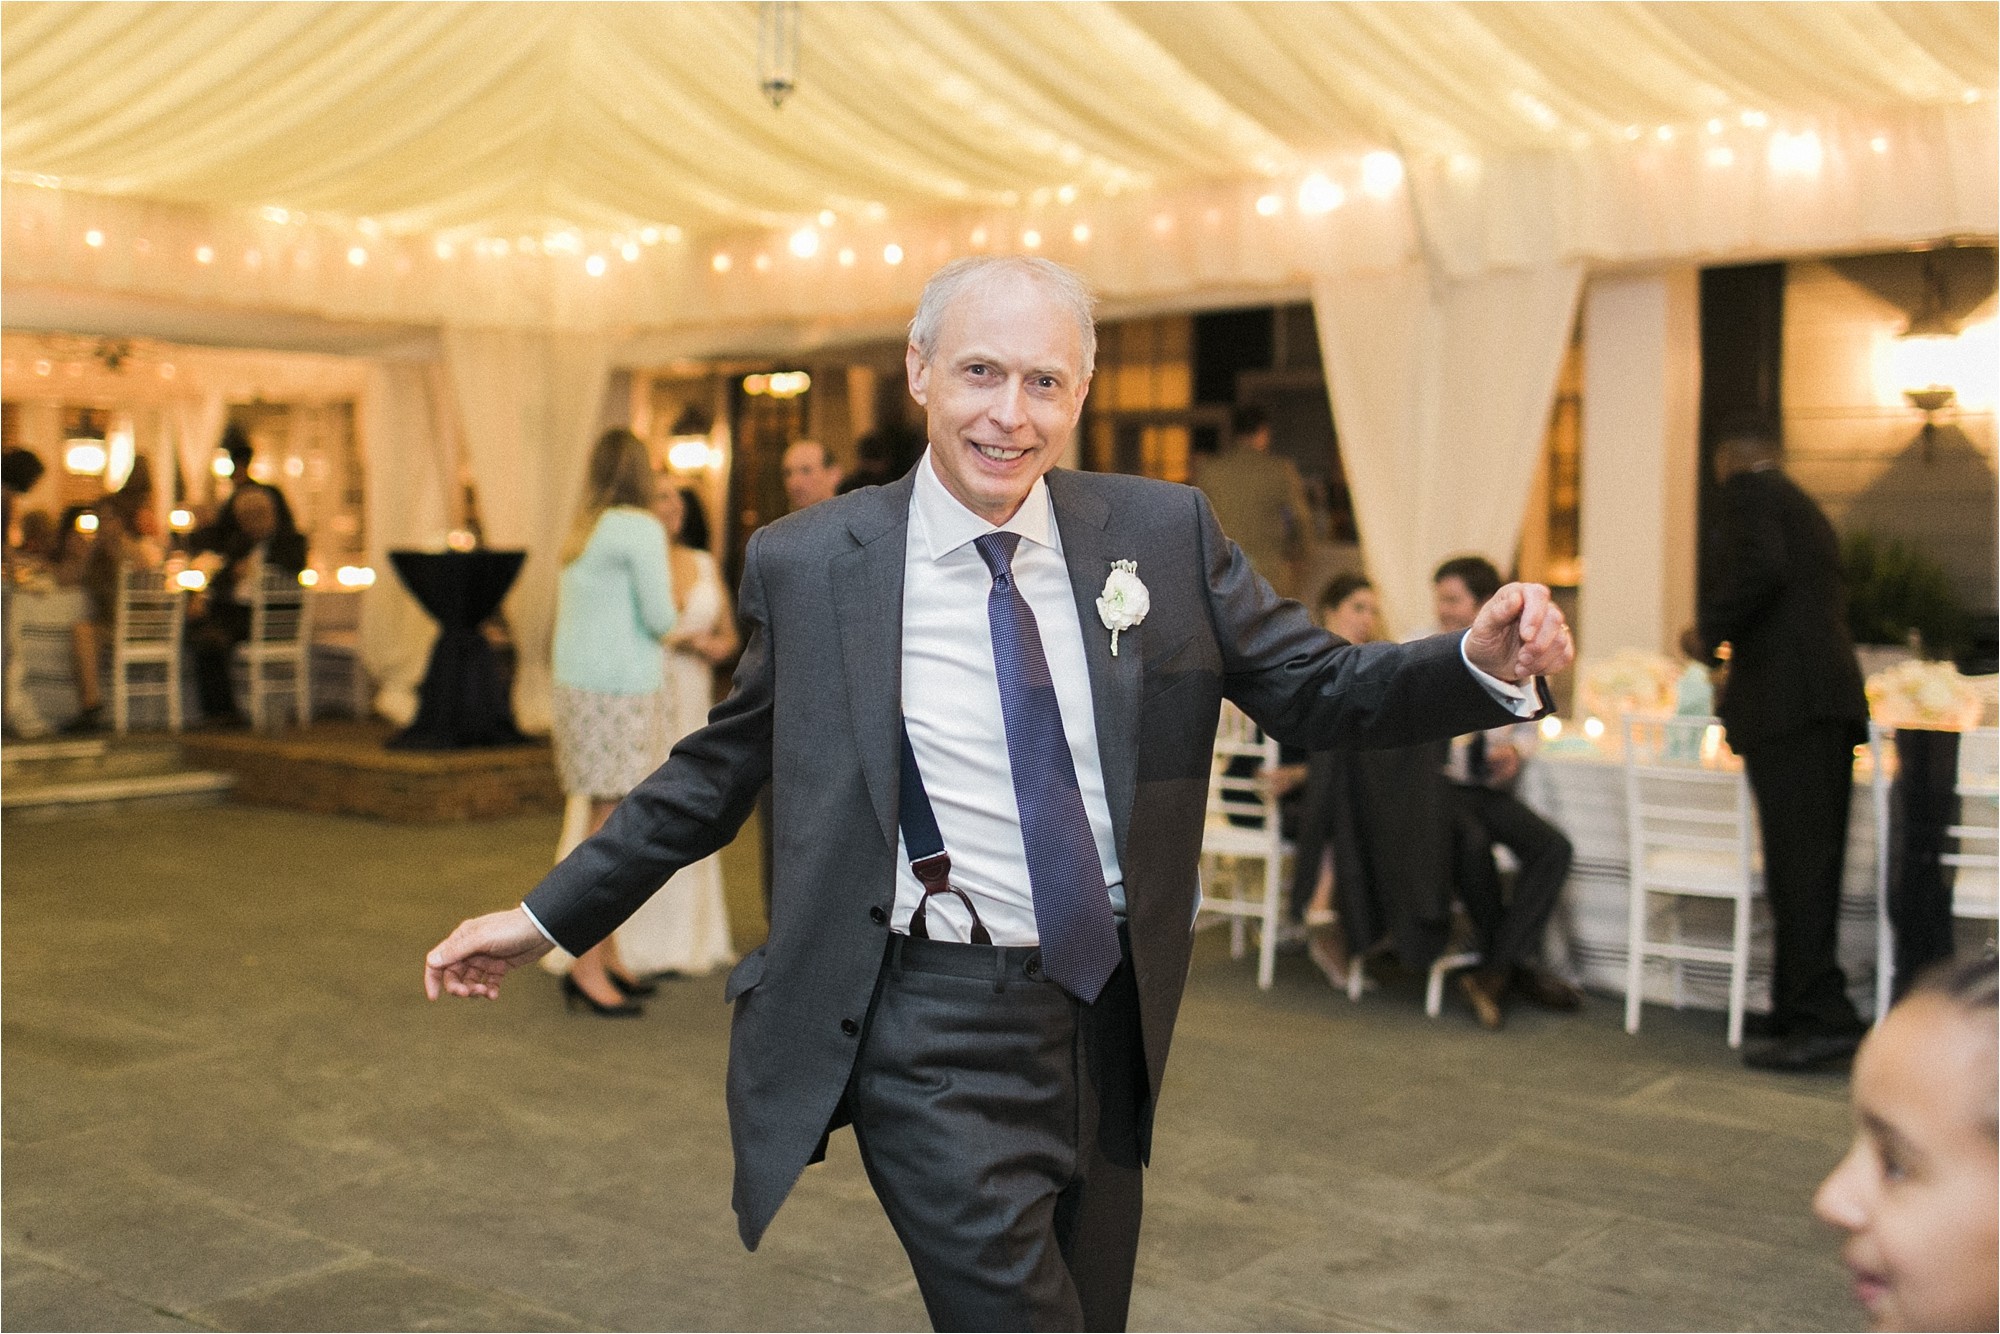 tom-jill-baltimore-maryland-industrial-elegant-wedding-065.JPG